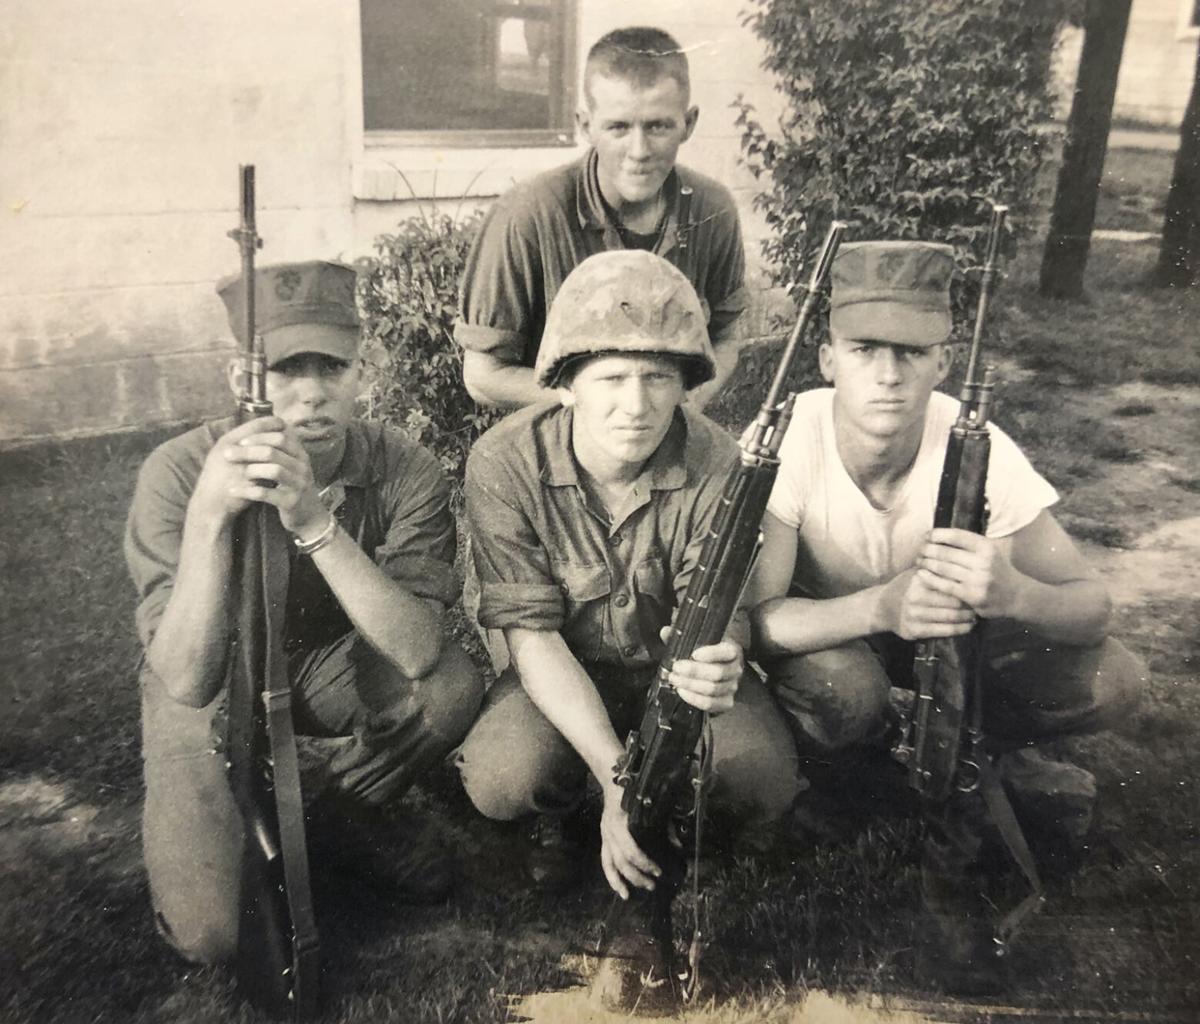 Vietnam War veteran Frank McGee finds closure 52 years after his friend's death